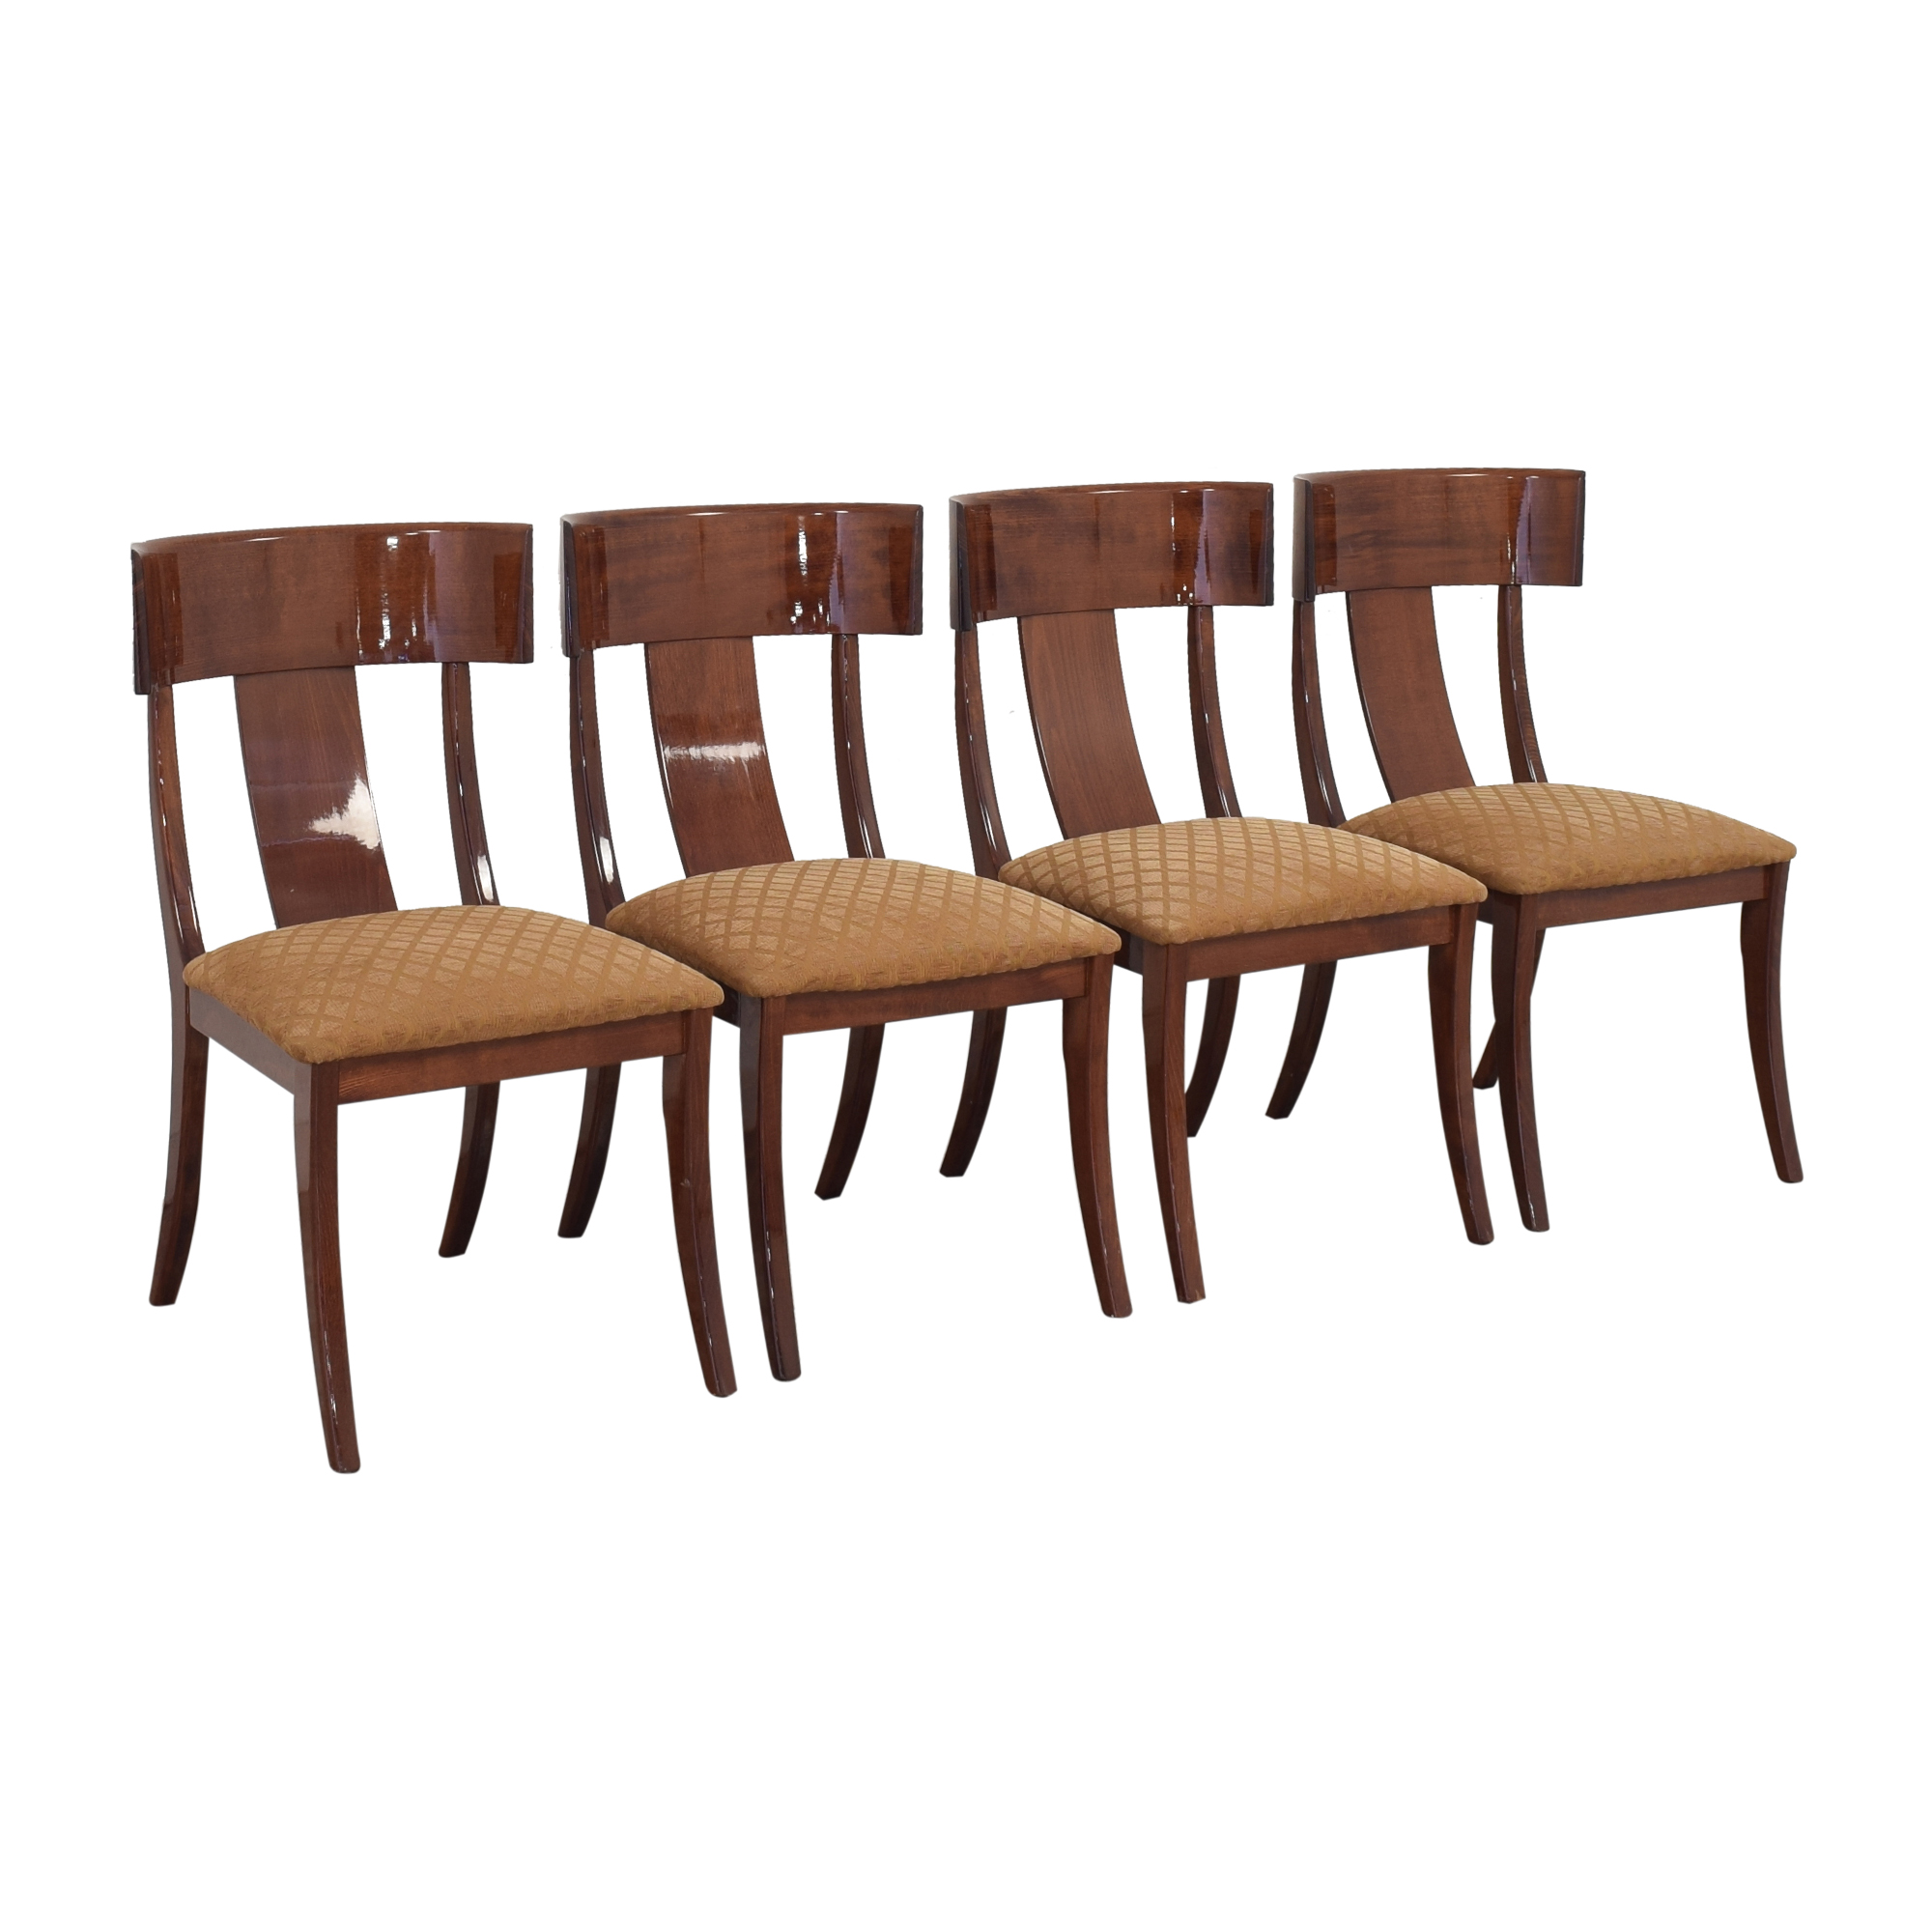 buy Pietro Constantini for Ello Klismos Dining Chairs Ello Furniture Chairs